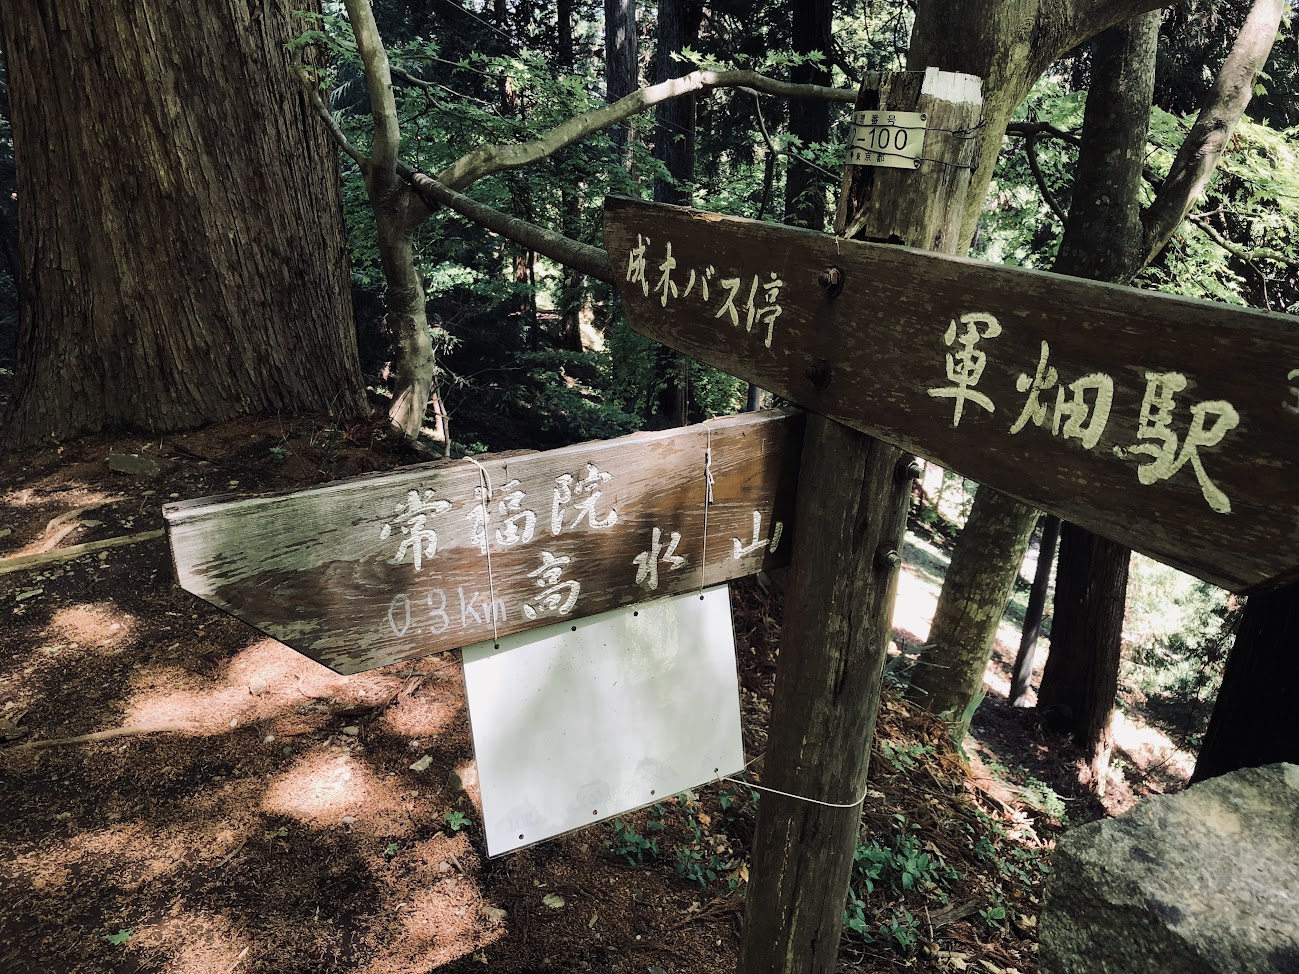 「Joufukuin Mt.Takamiz 常福院 高水山」 direction